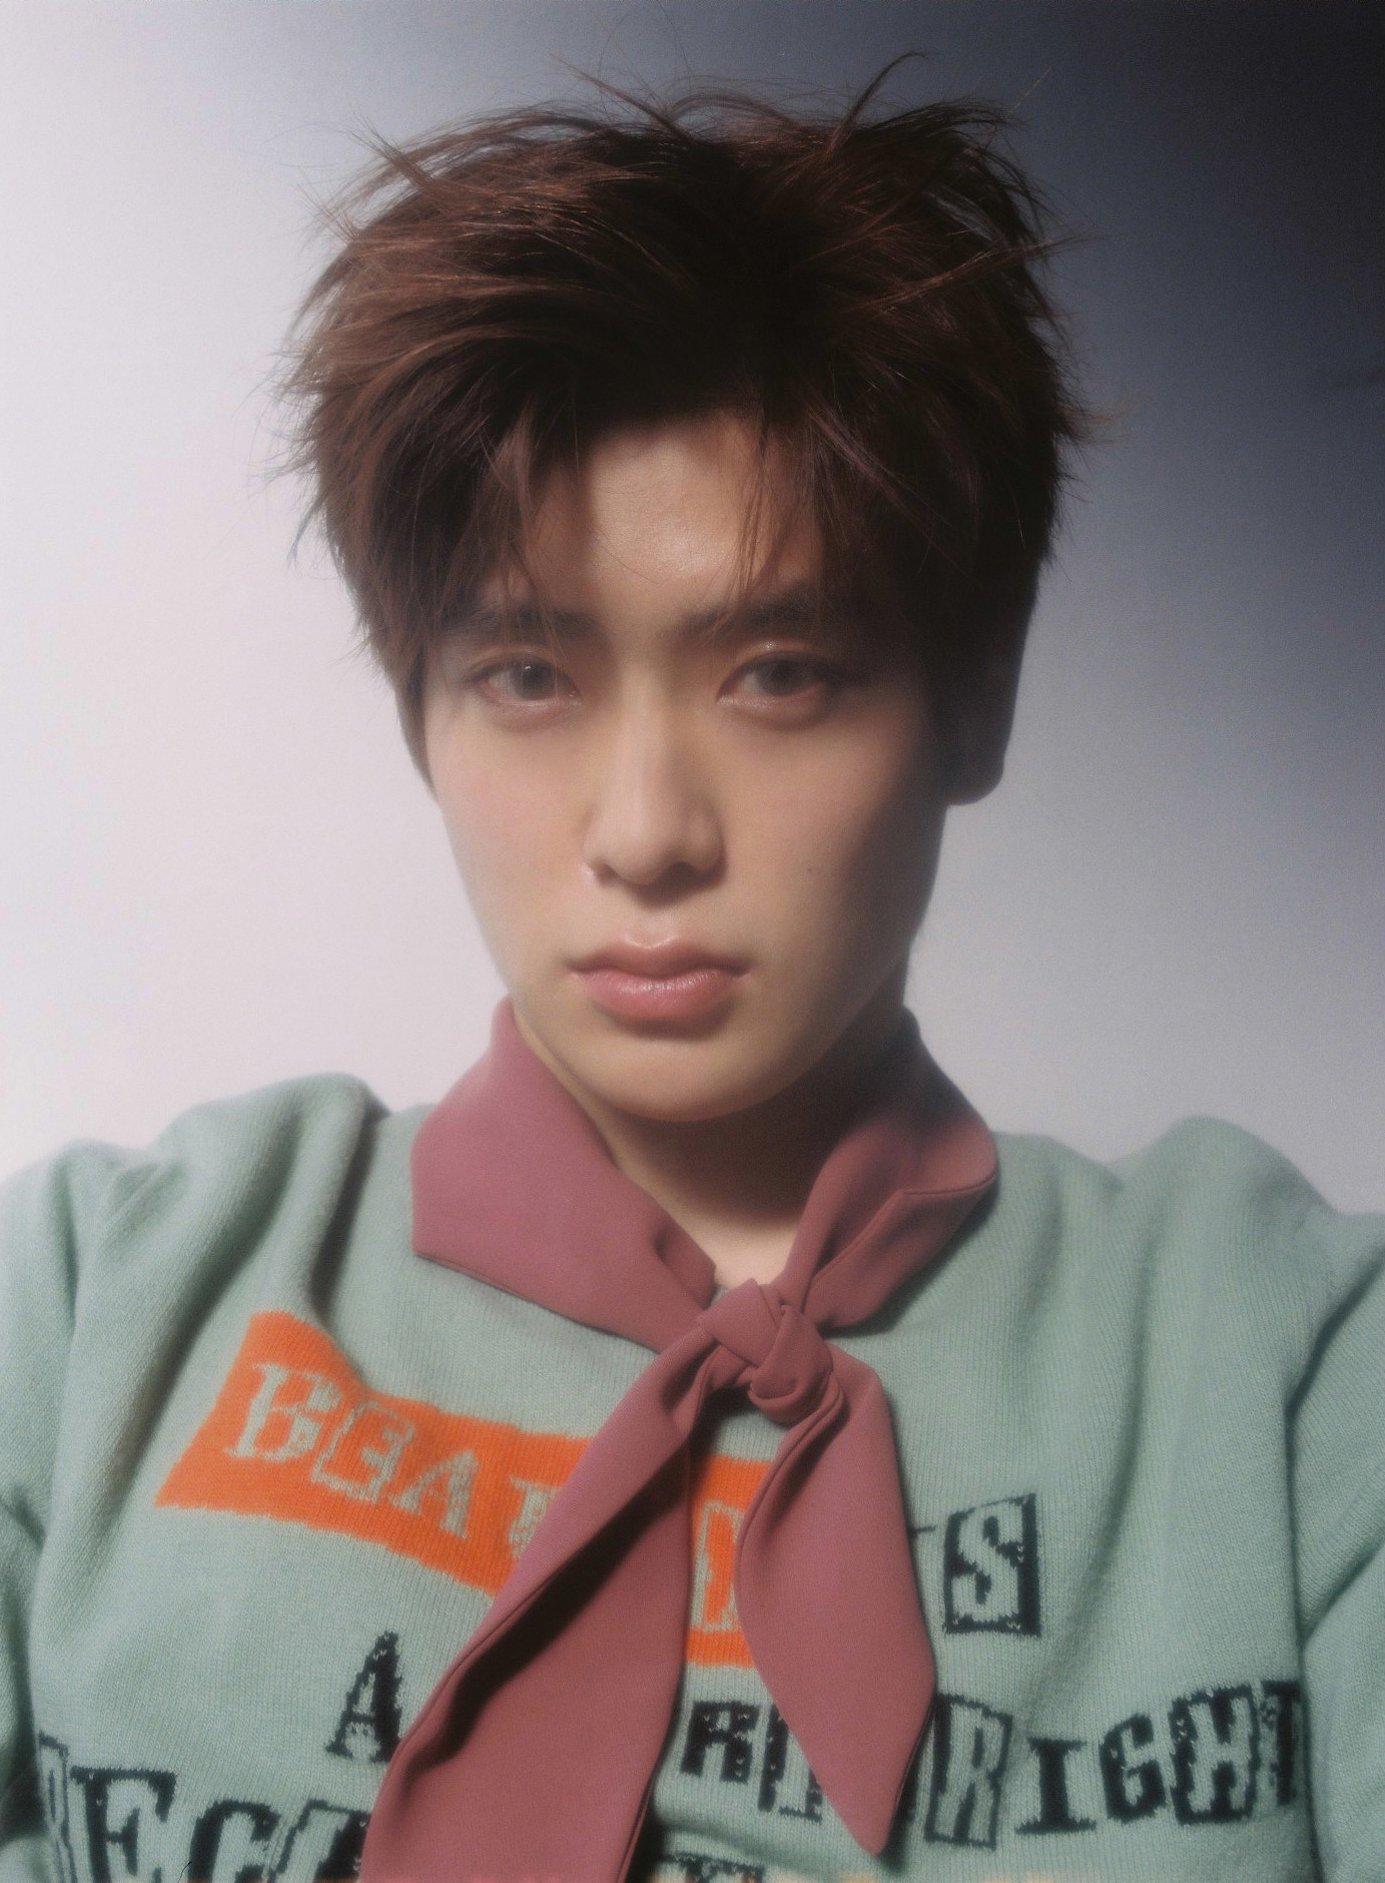 Update NCTs Jaehyun Shares More Teaser Images For Upcoming SM STATION Track  Soompi